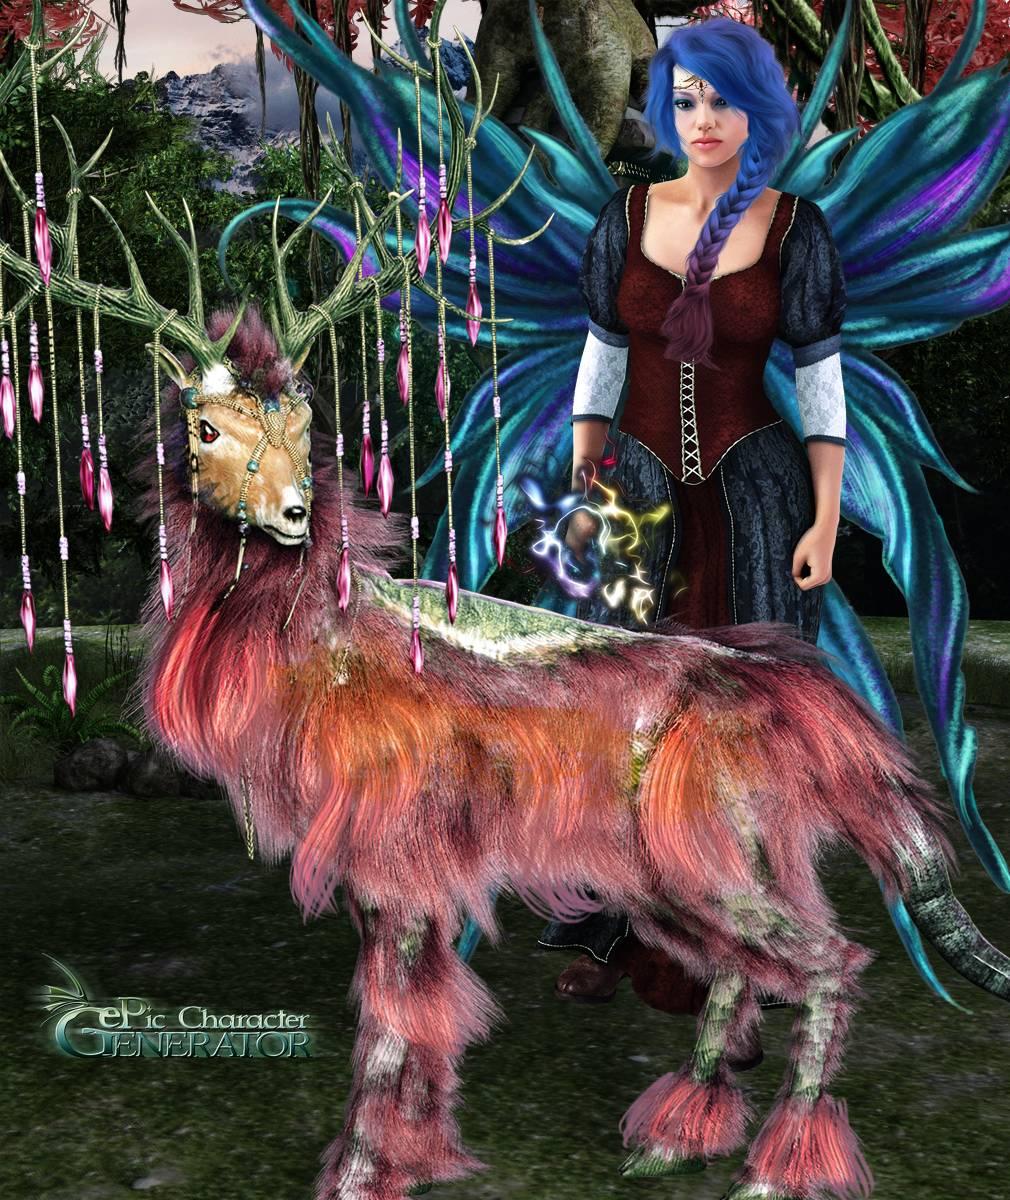 ePic Character Generator Season 2 Fantasy Bestiary Screenshot 09